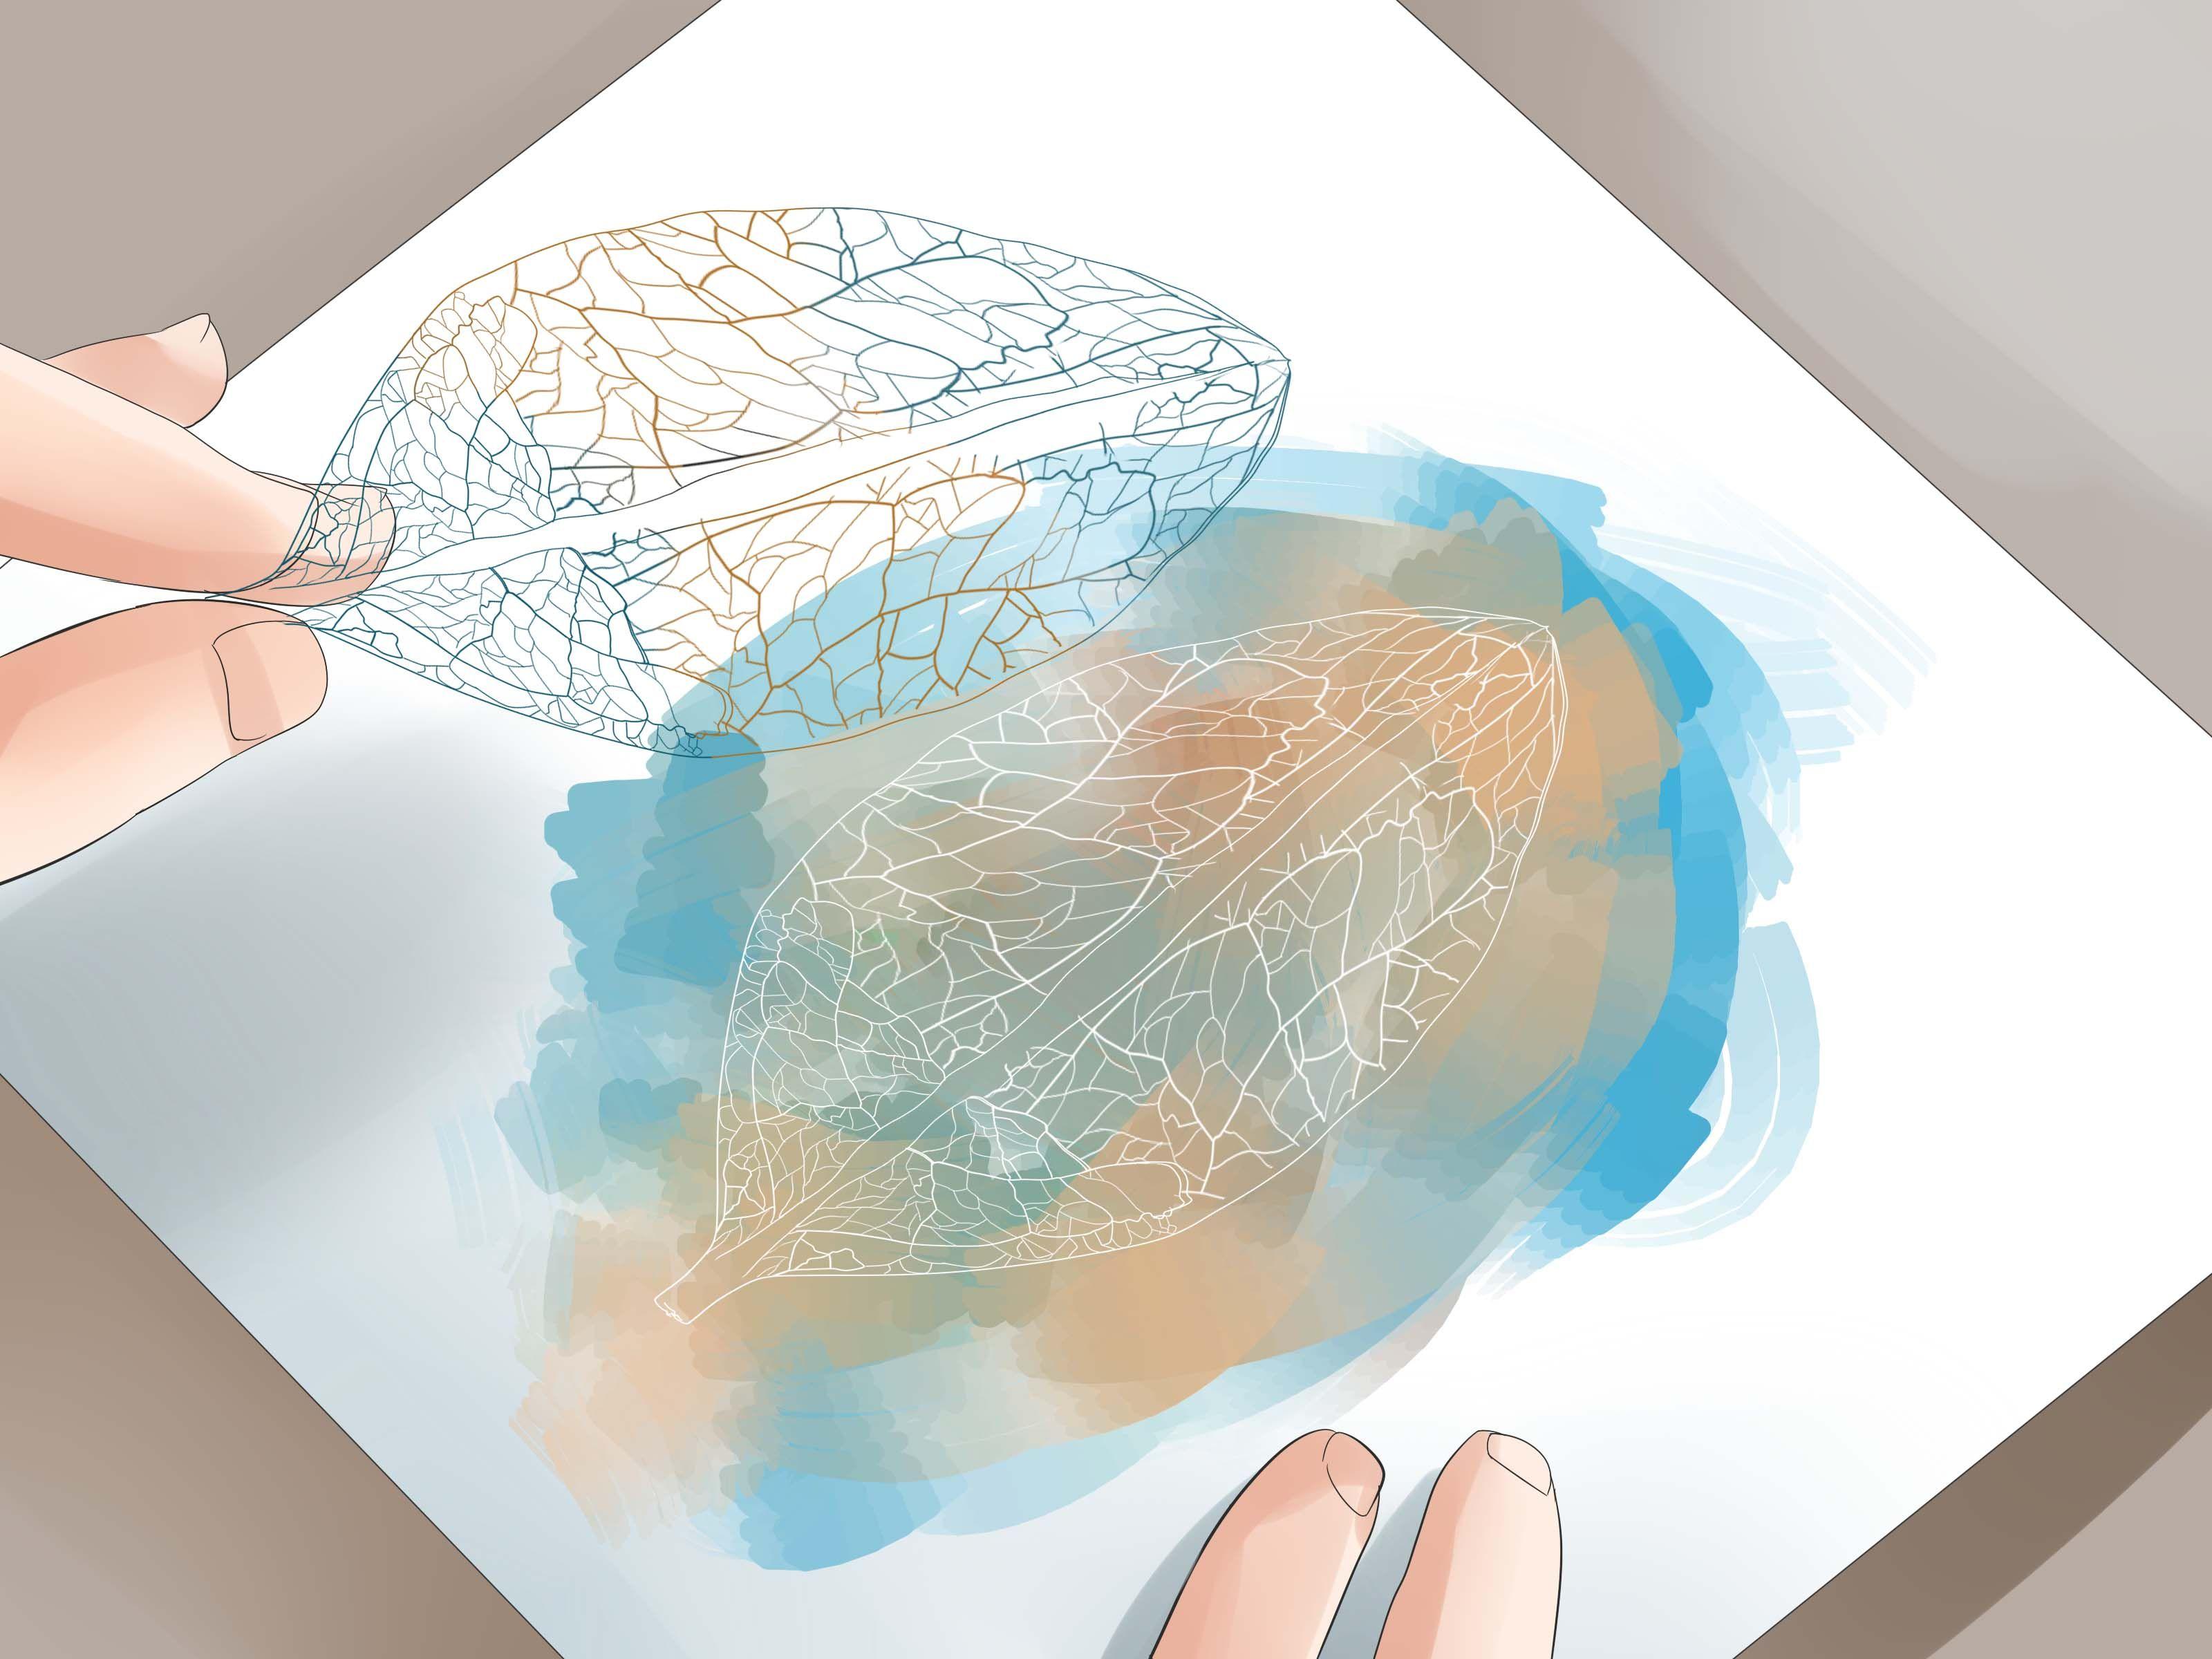 Hobbies, handicrafts: site map (articles)